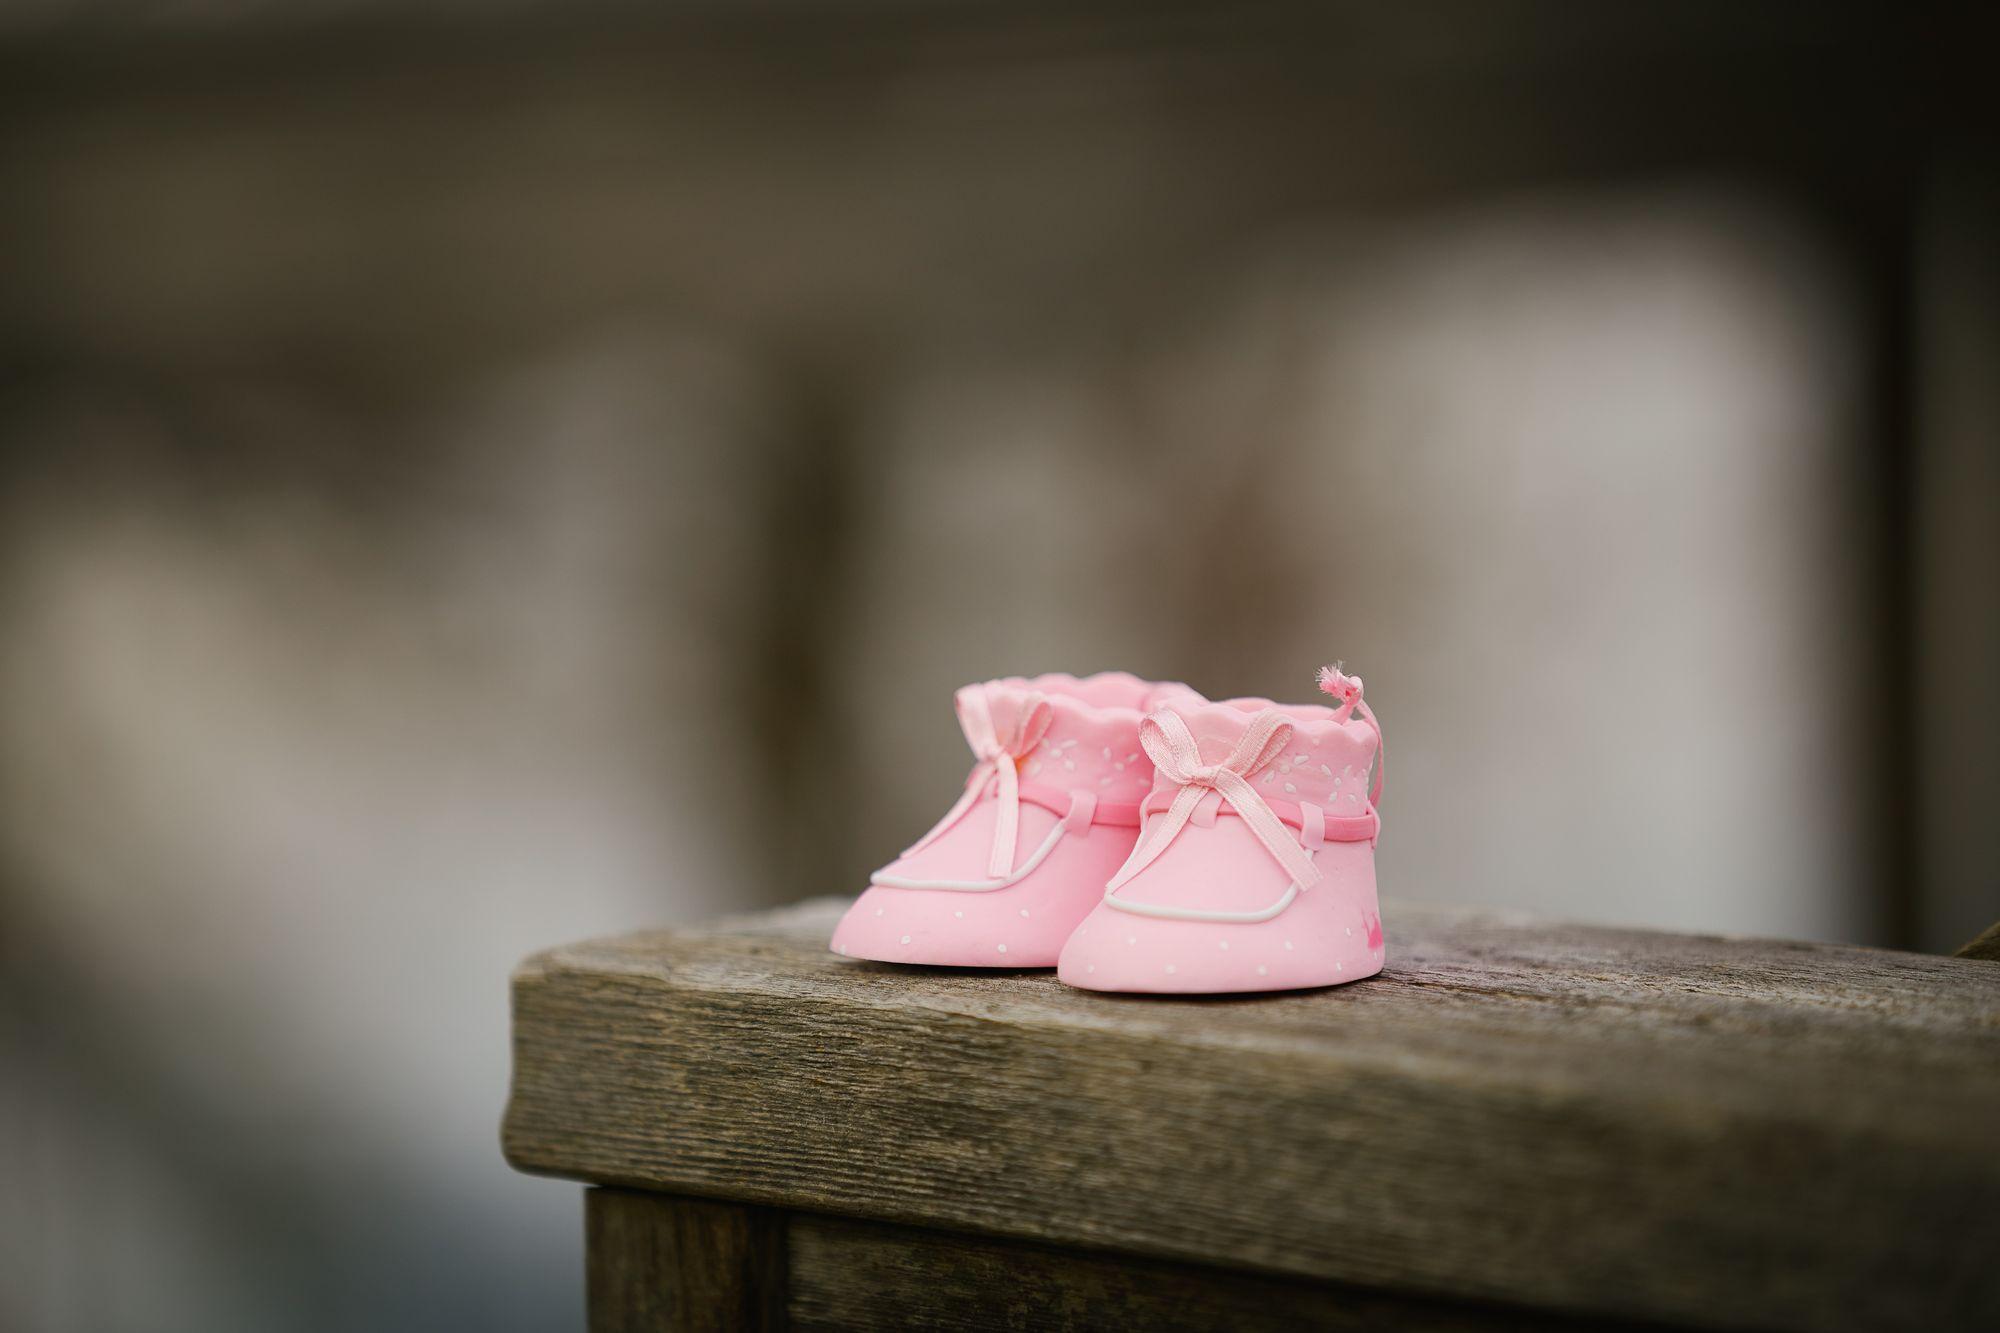 Pro-Choice Speech: The Deception Of Dehumanizing The Preborn